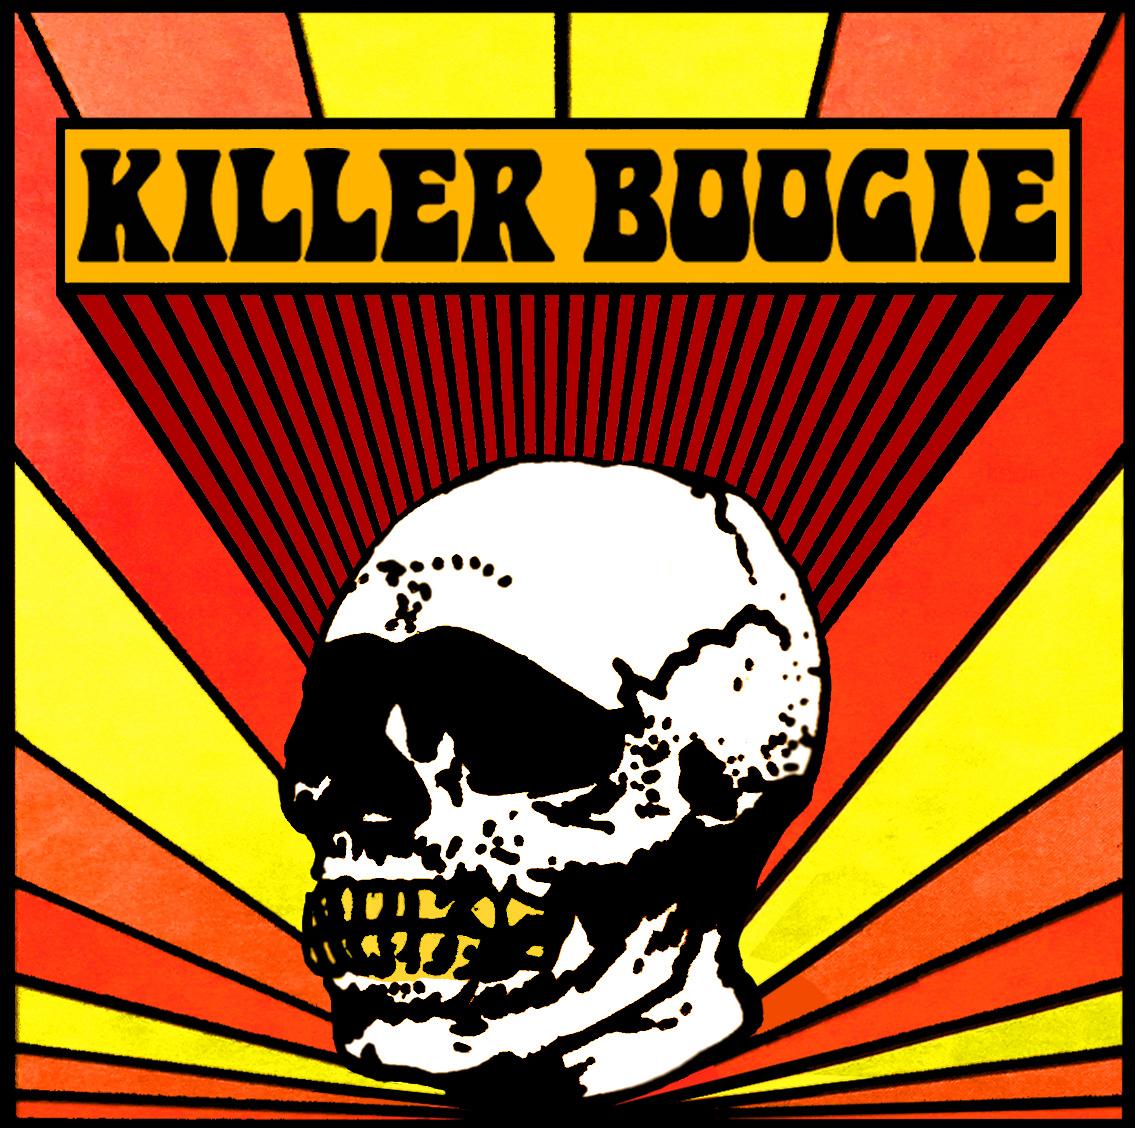 Killer Boogie - Detroit [LP]